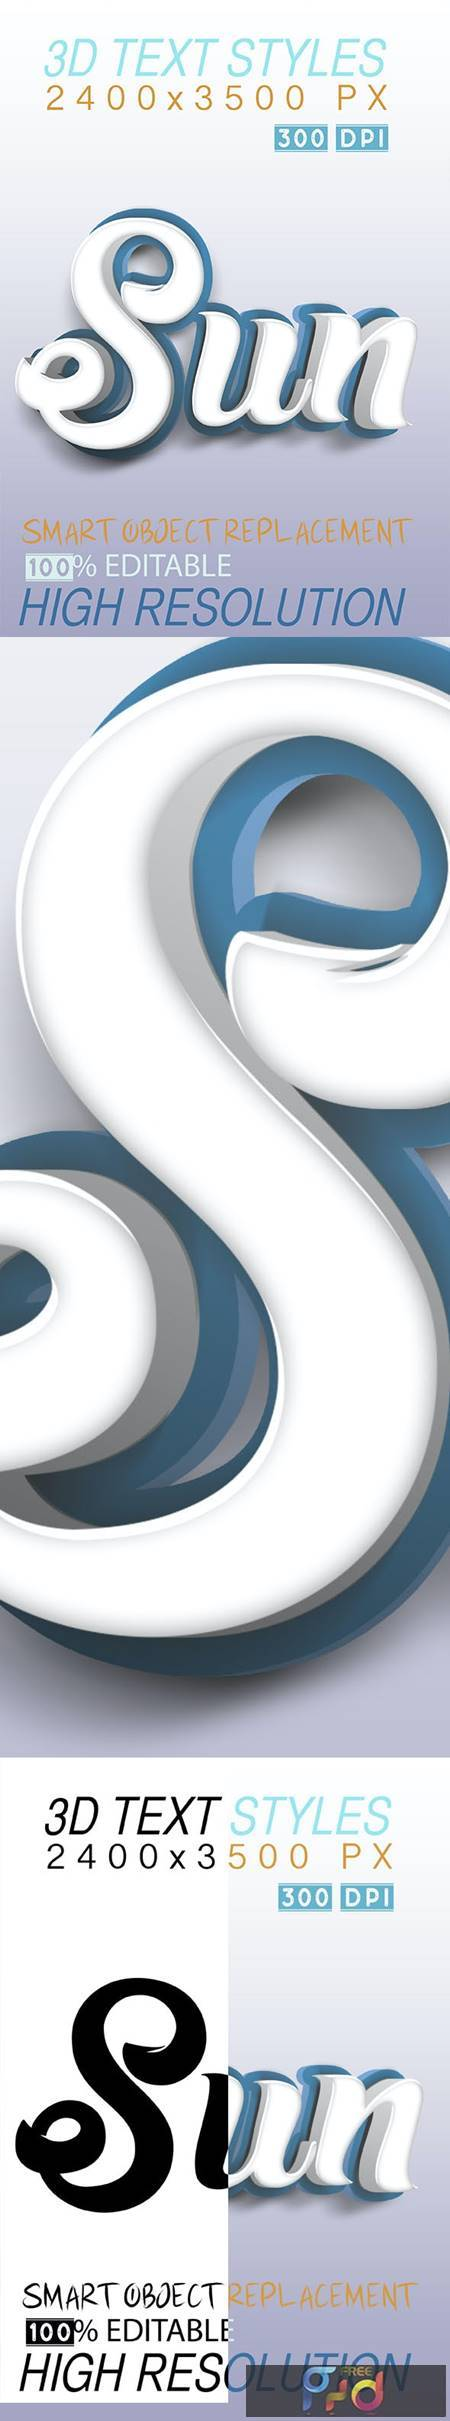 3D Text Effect Styles Blue 26654738 1